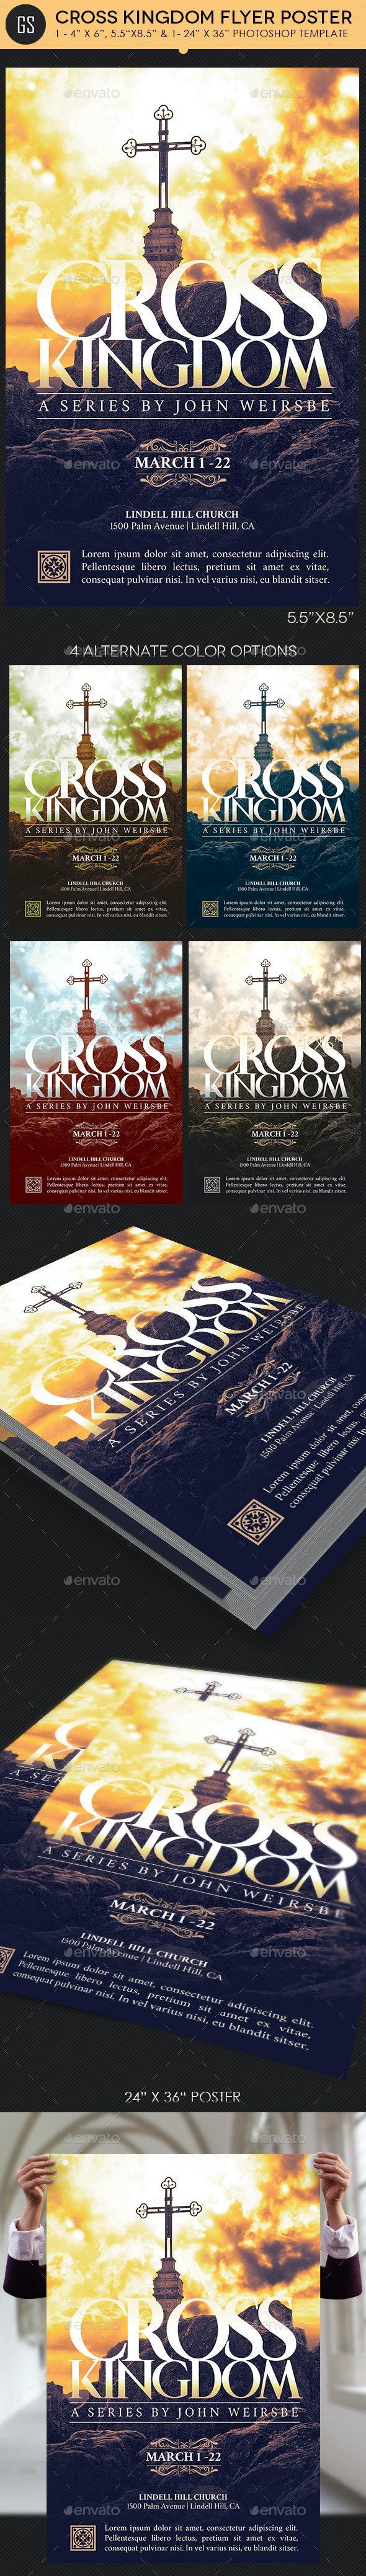 Cross Kingdom Flyer Poster Template - Church Flyers